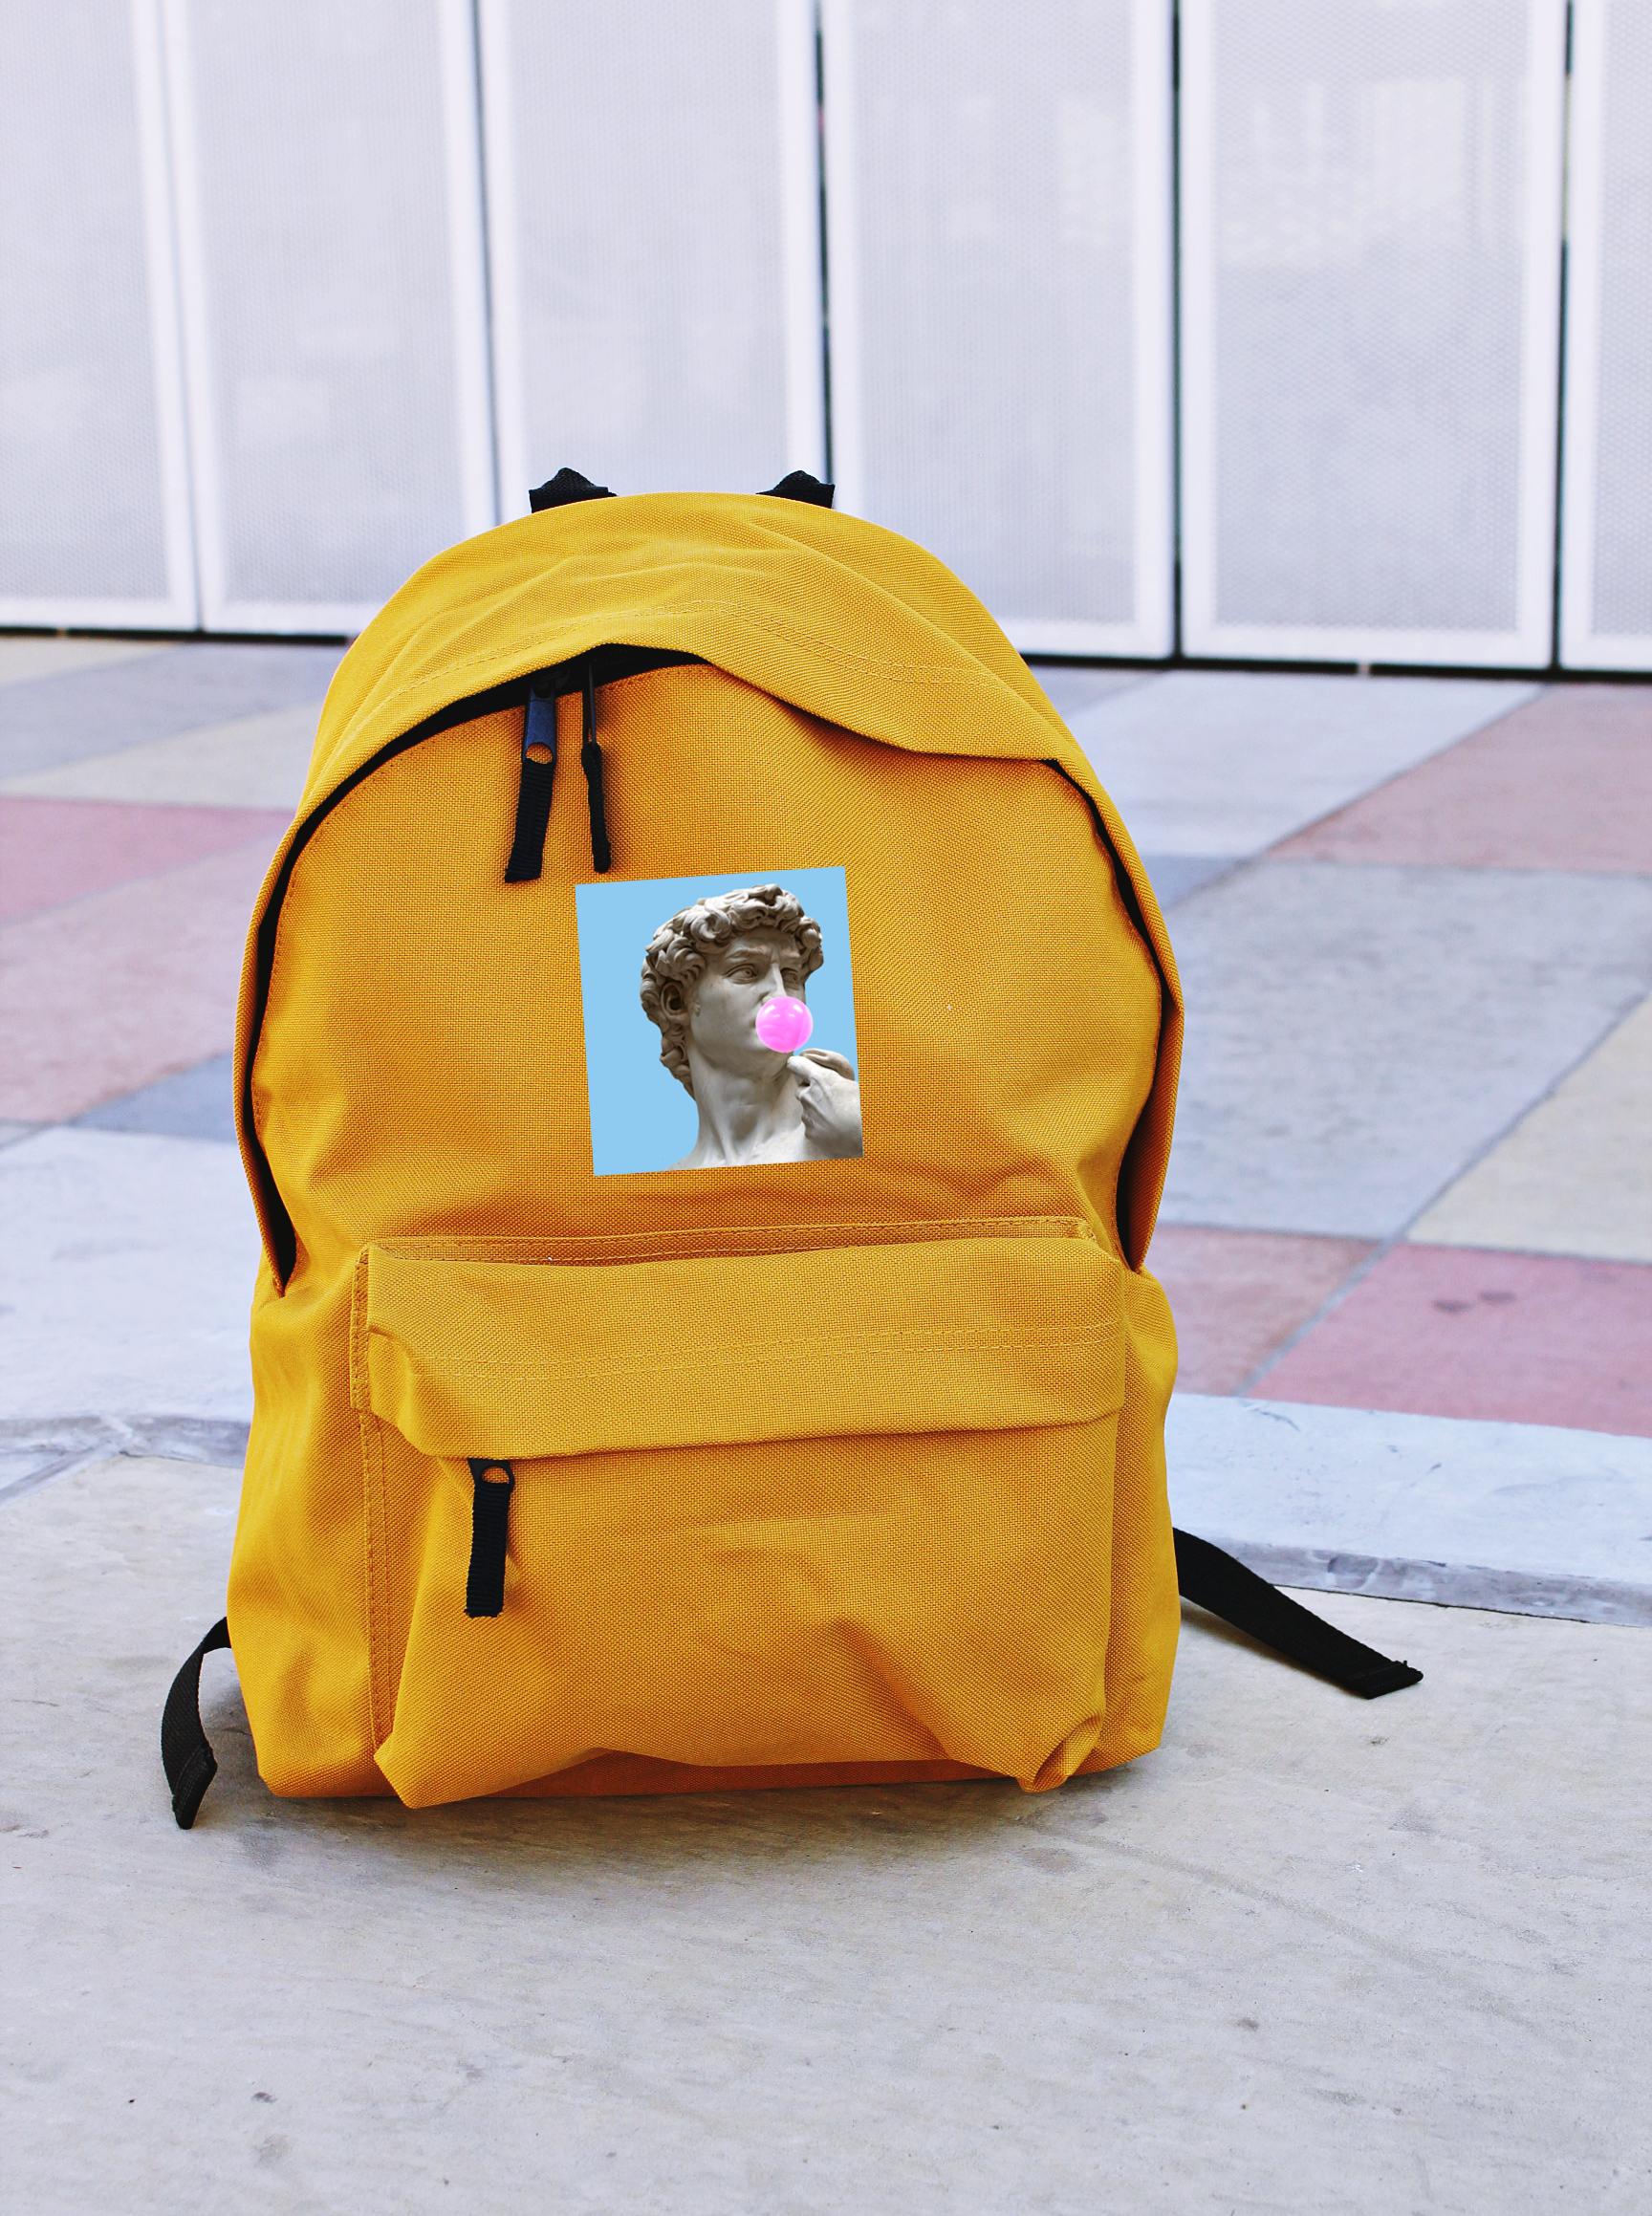 Plecak Szkolny A4 Dawid Michal Aniol Rzezba Guma Balon Fake Art Duzy Bags Backpacks Fashion Backpack